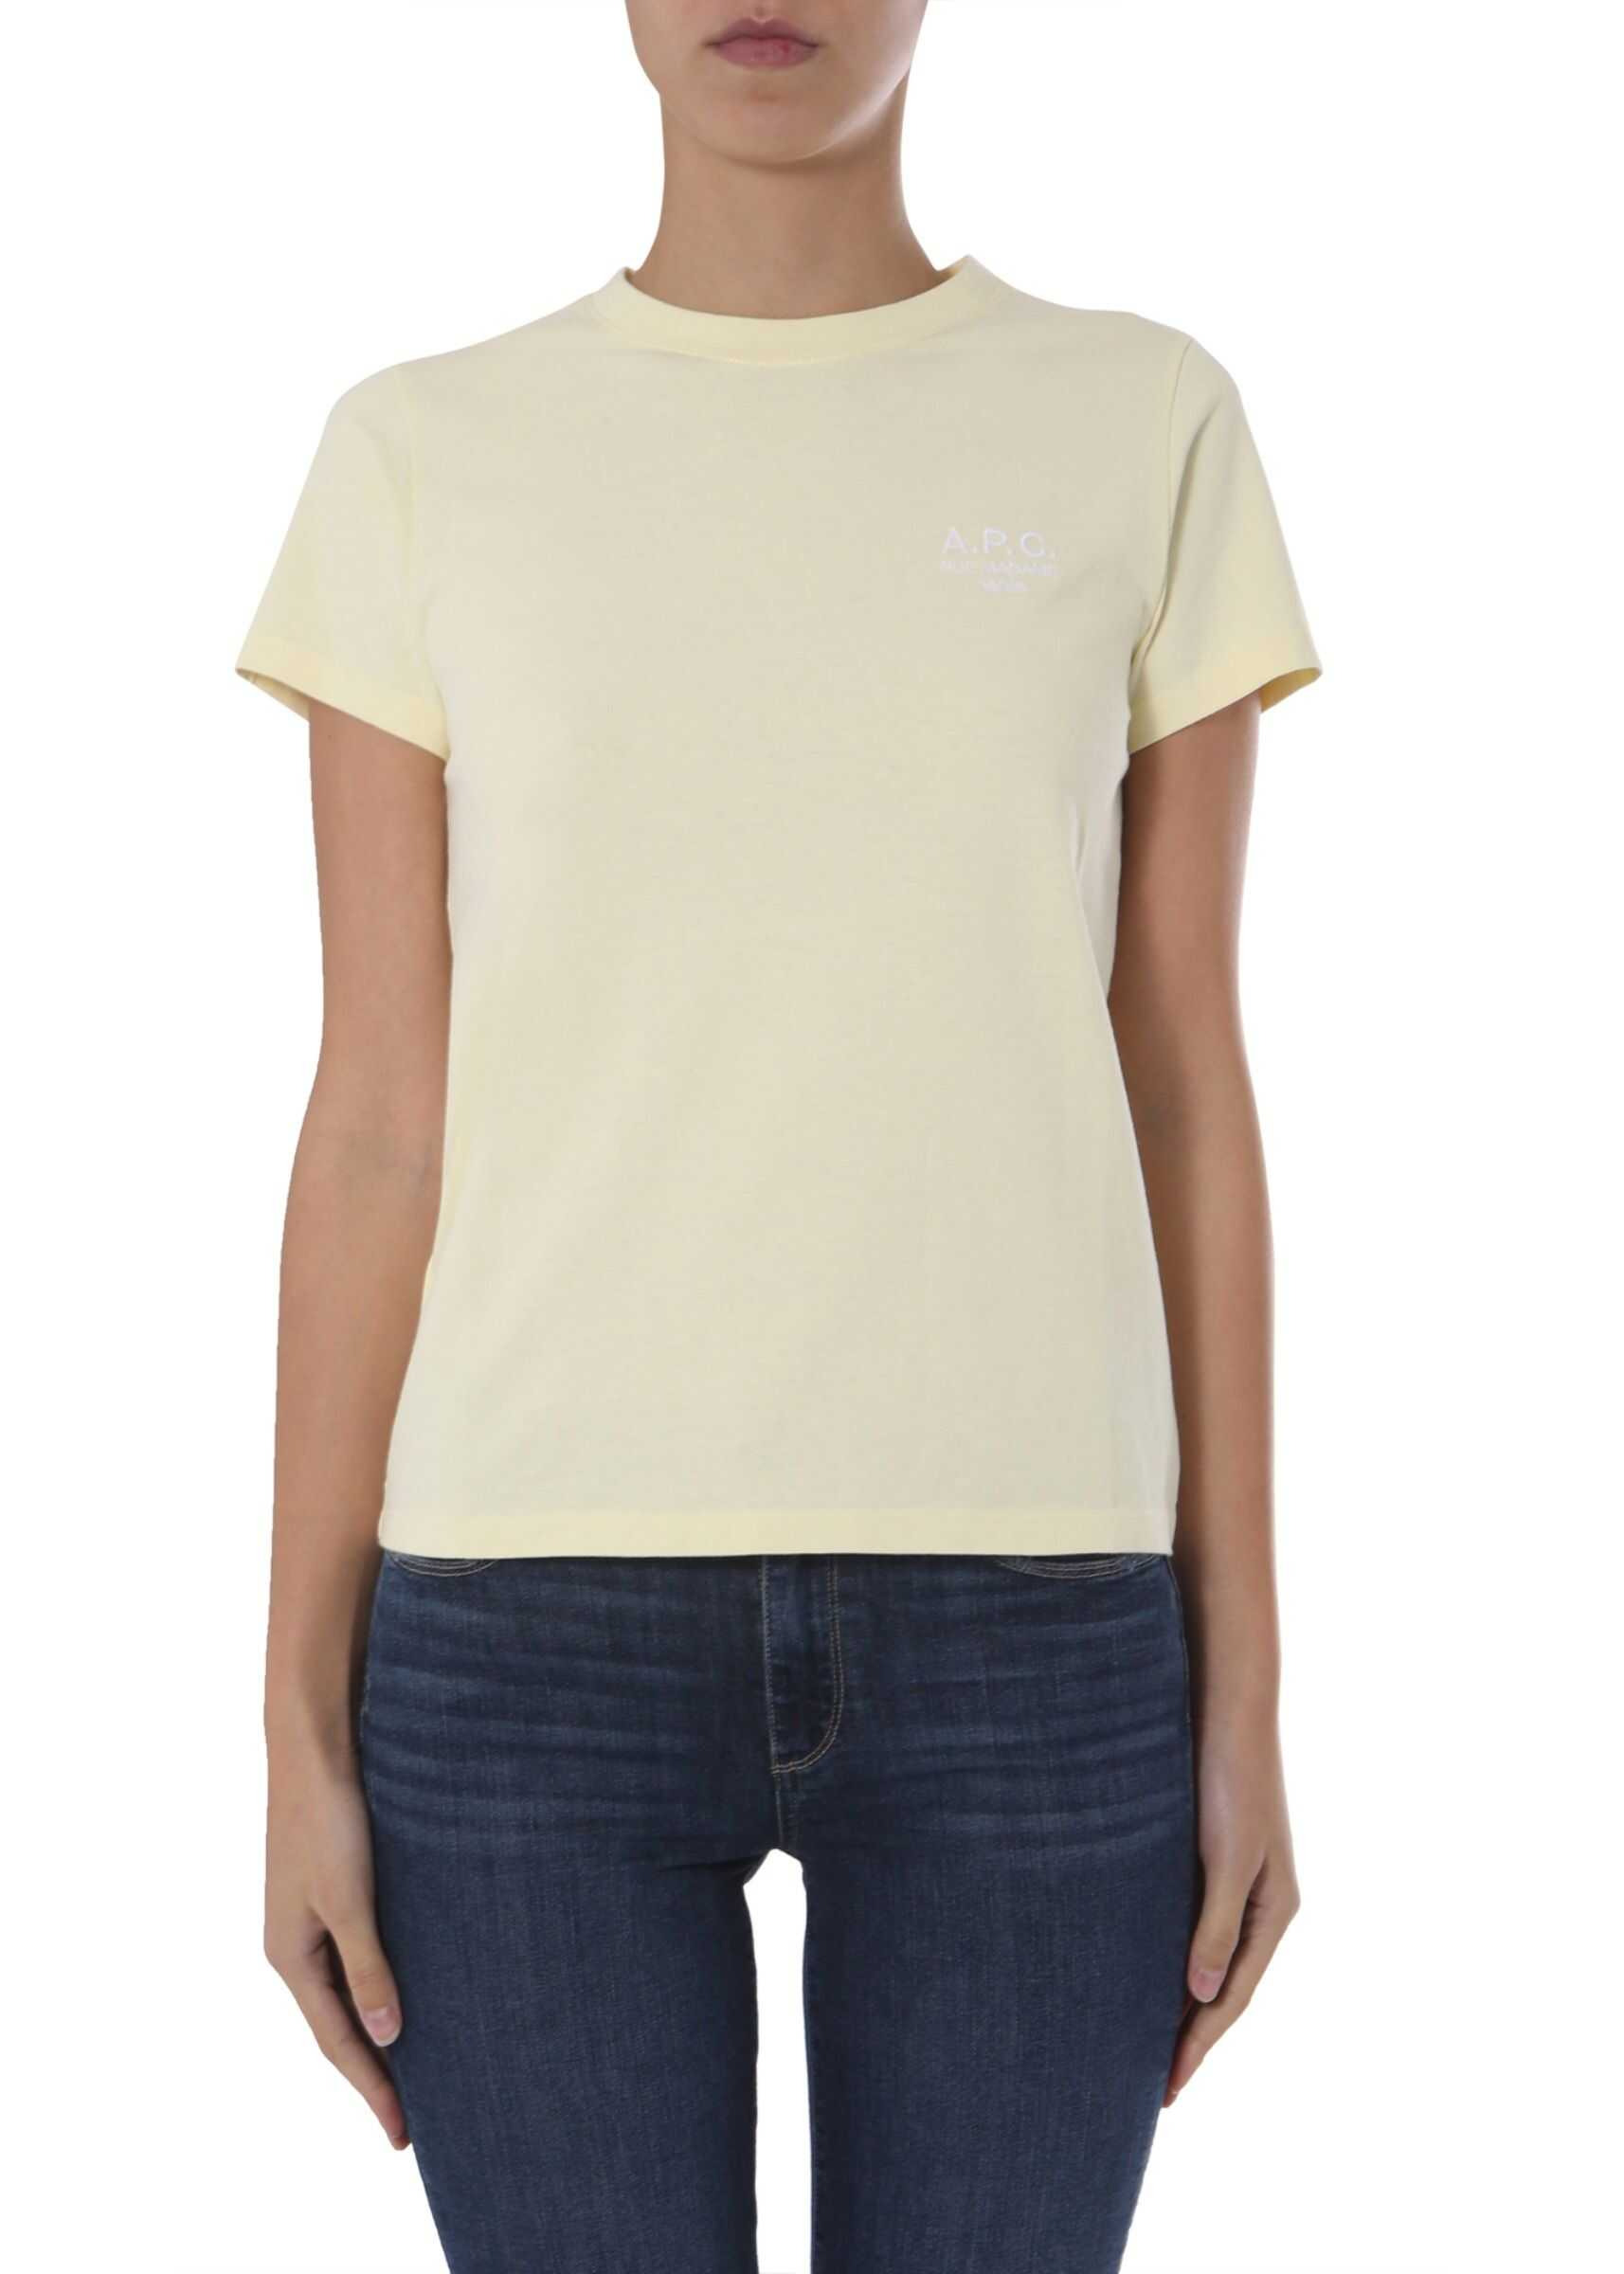 A.P.C. Round Neck T-Shirt YELLOW